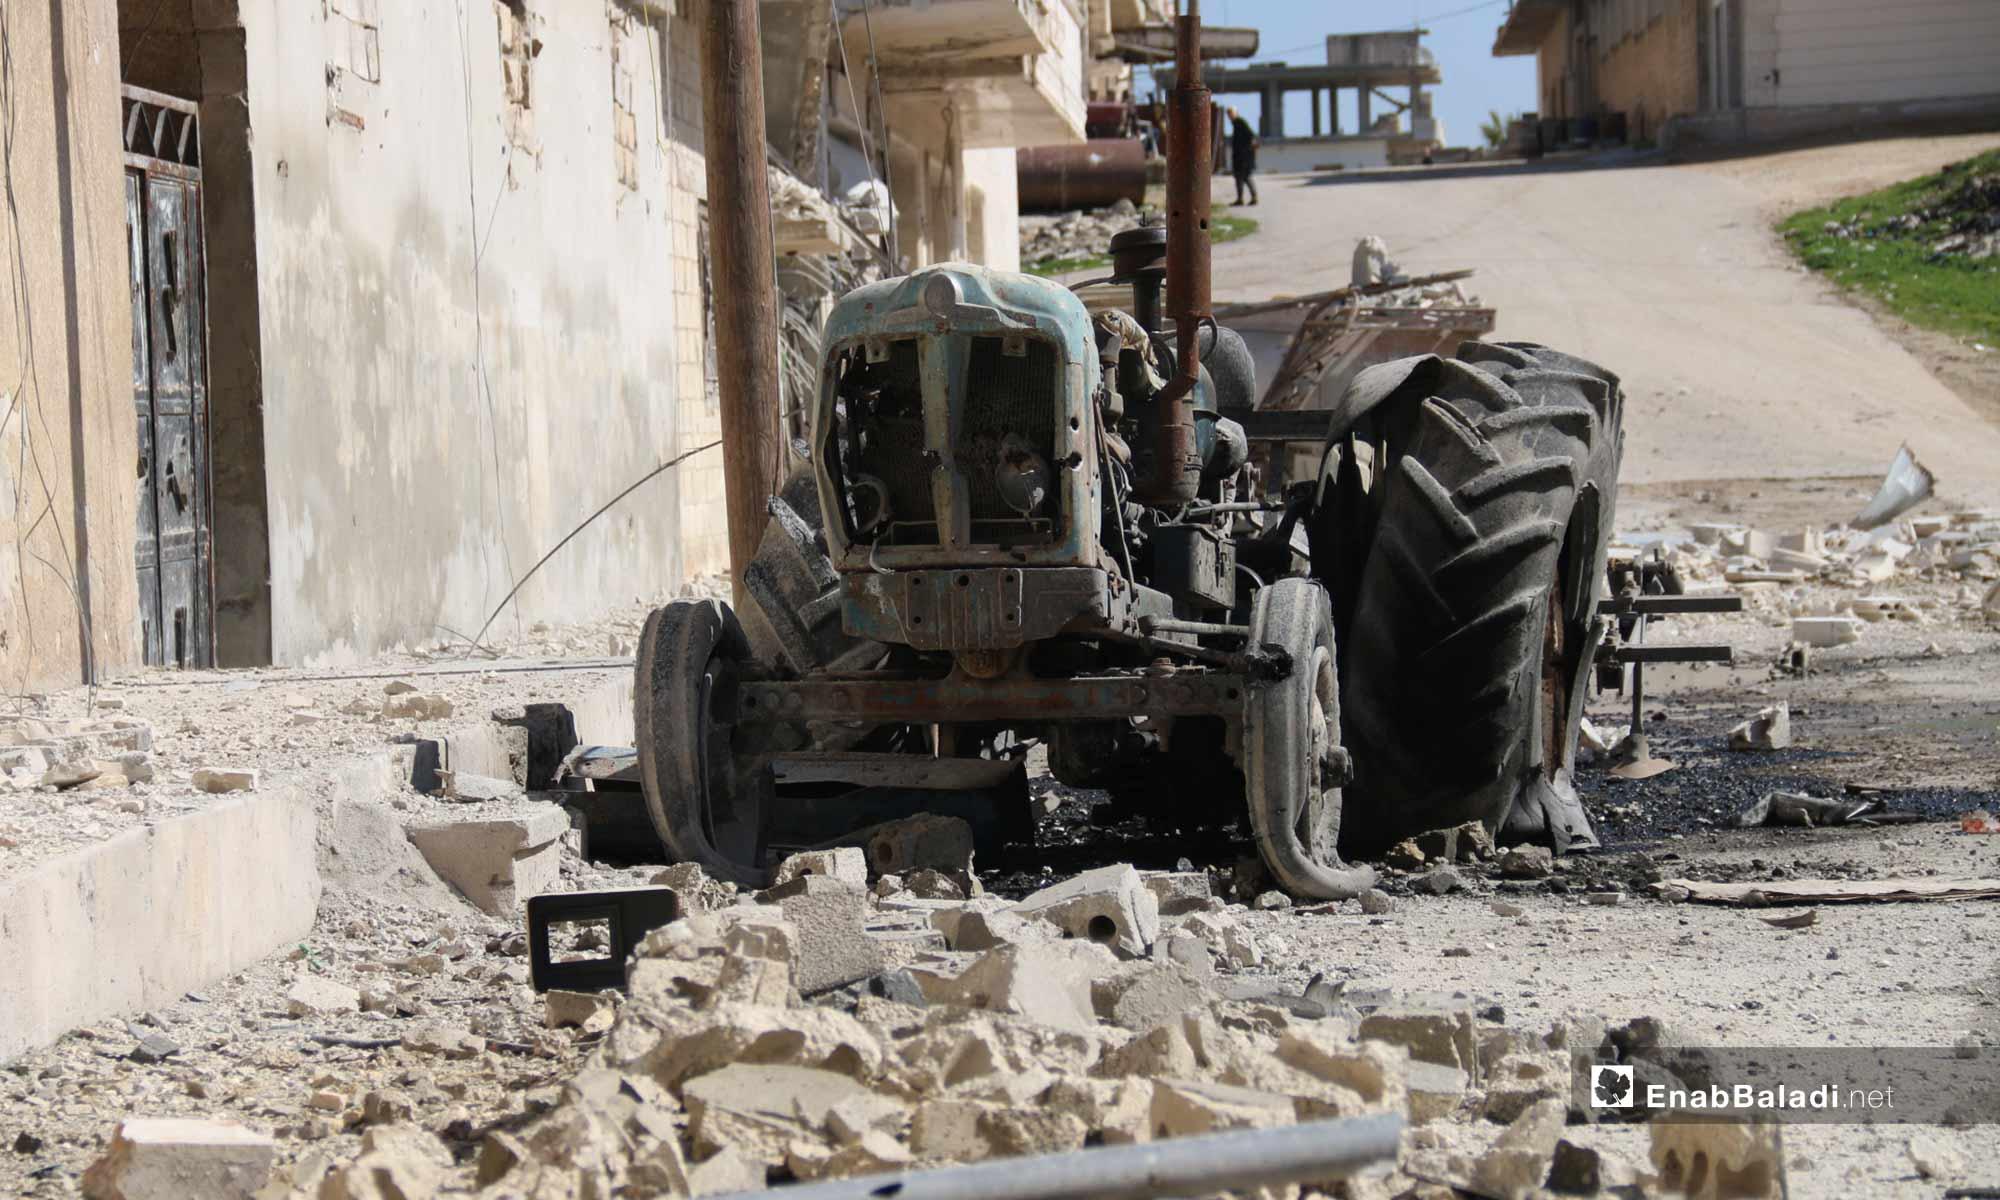 Destruction that Befell the City of Khan Shaykhun due to Shelling, Idlib – February 18, 2019 (Enab Baladi)